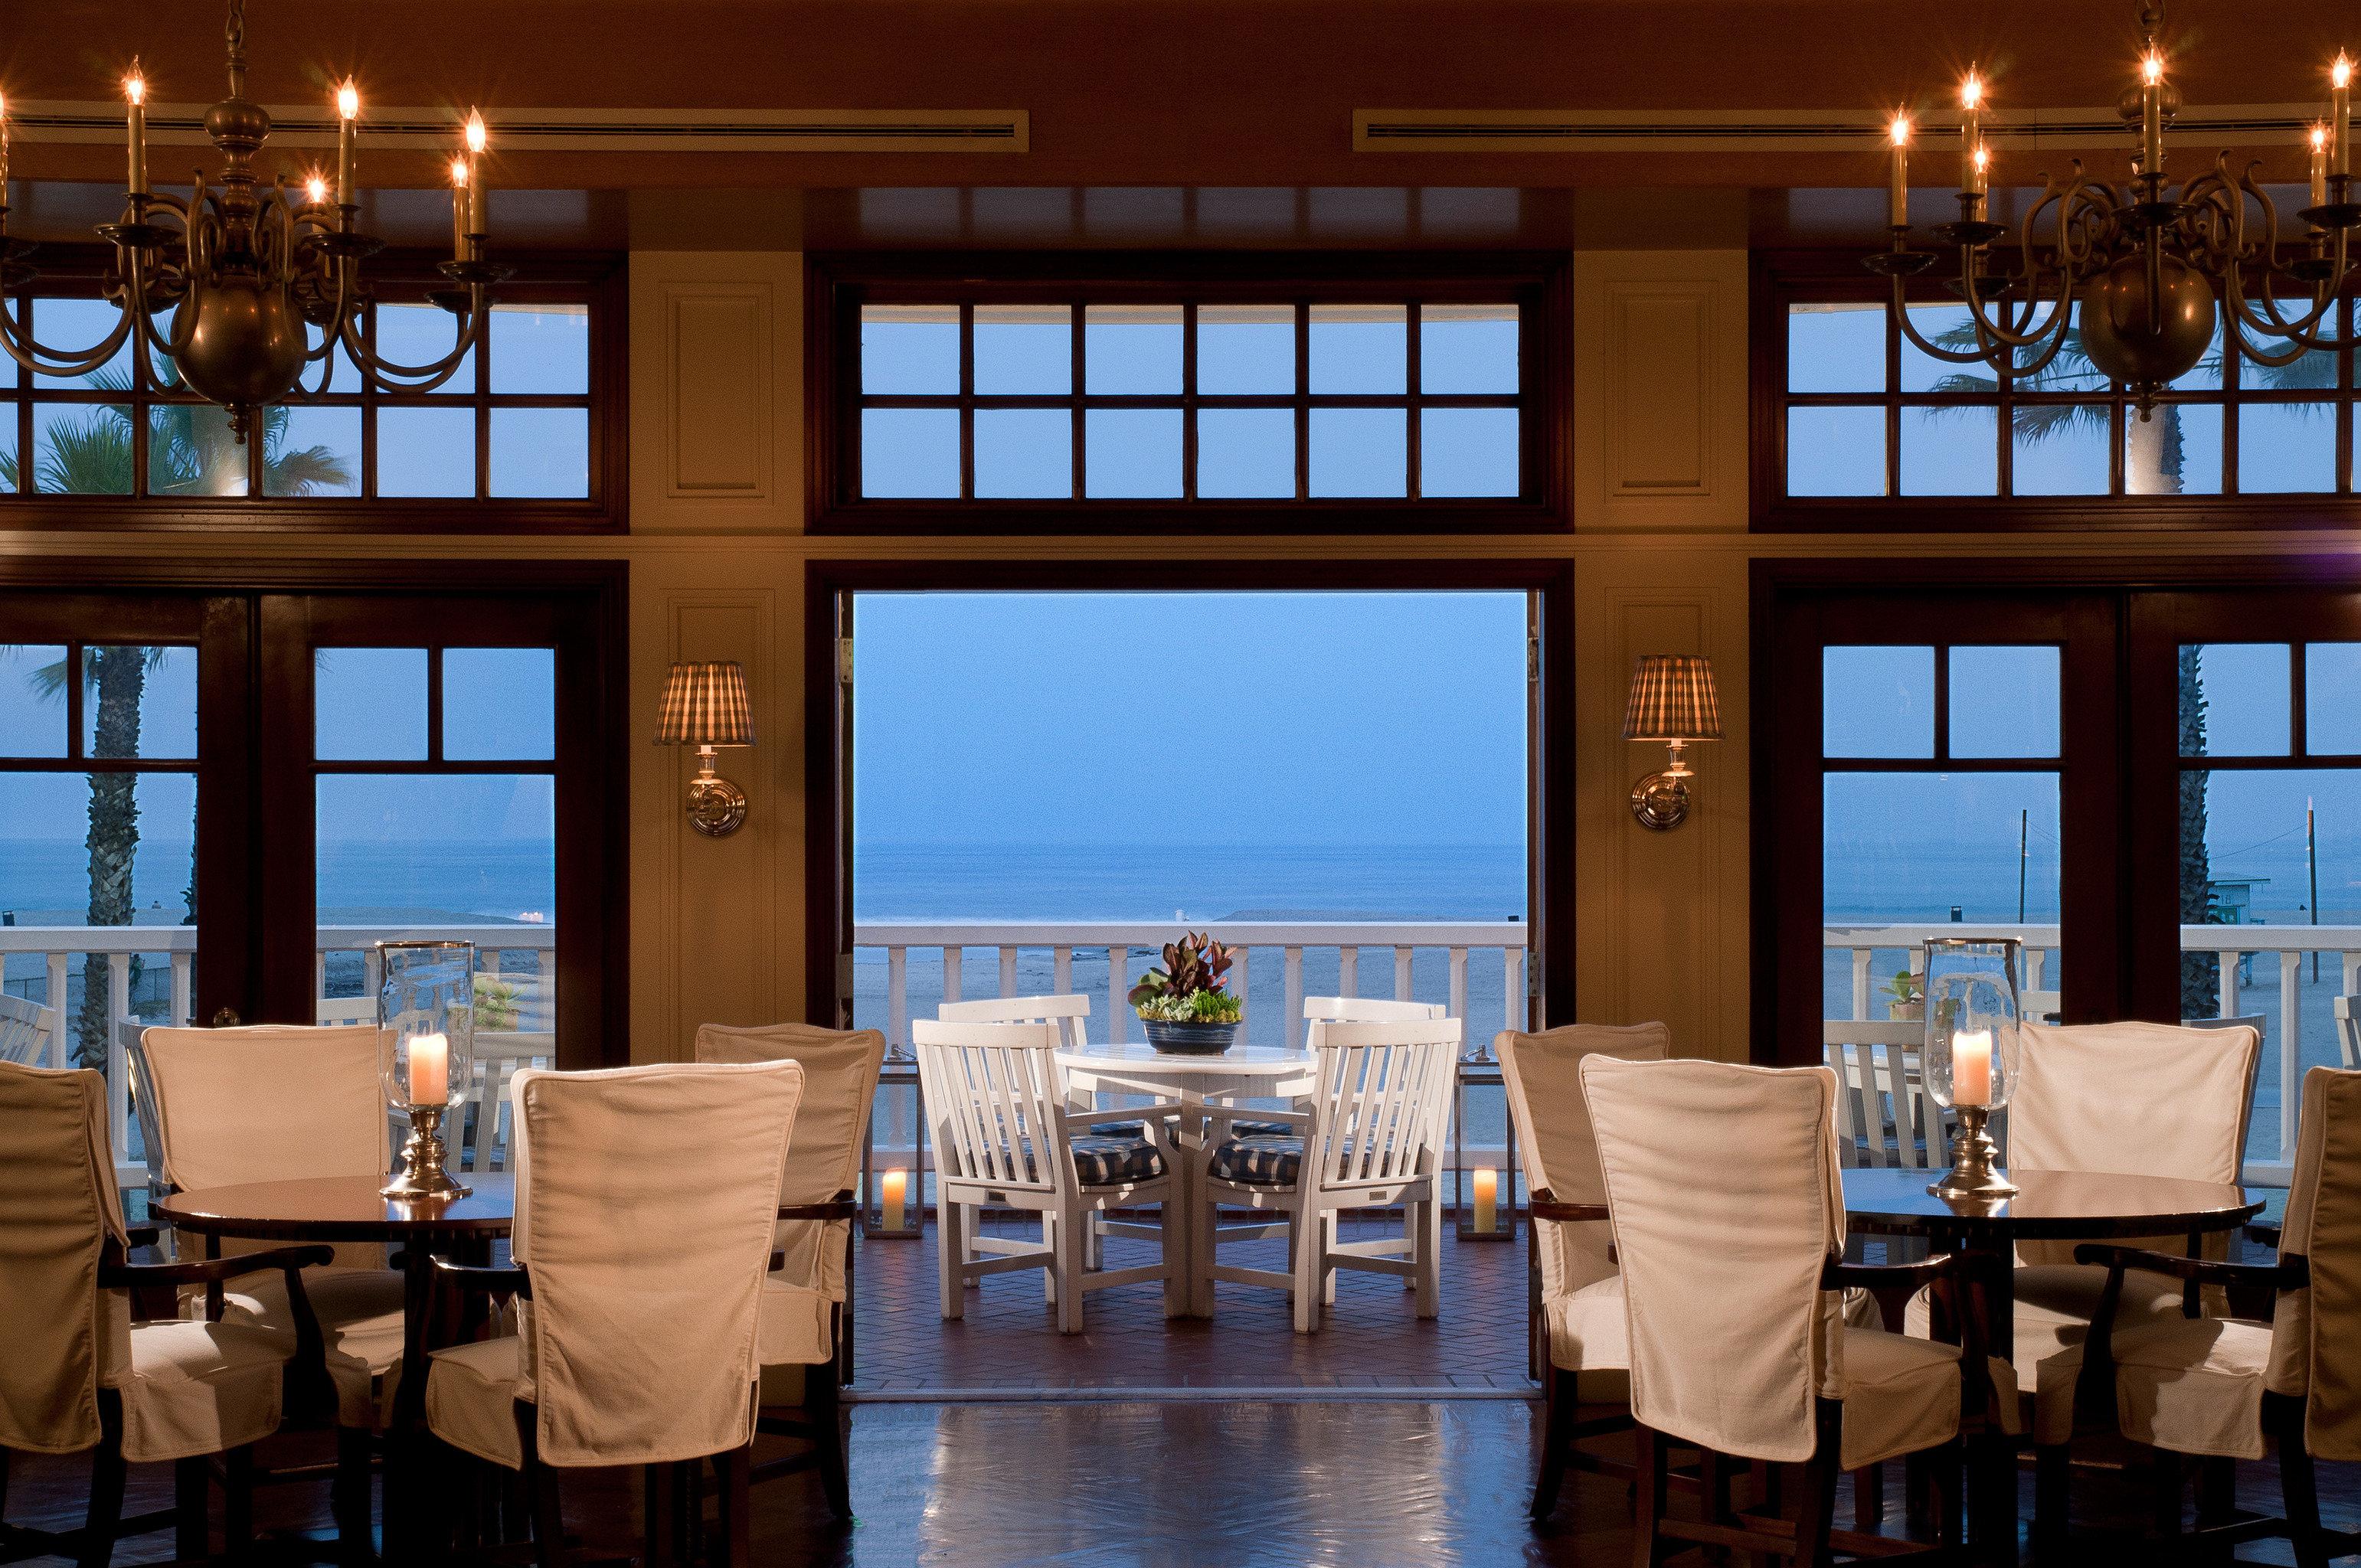 Bar Dining Drink Eat Hotels Luxury Modern restaurant Resort home overlooking Island